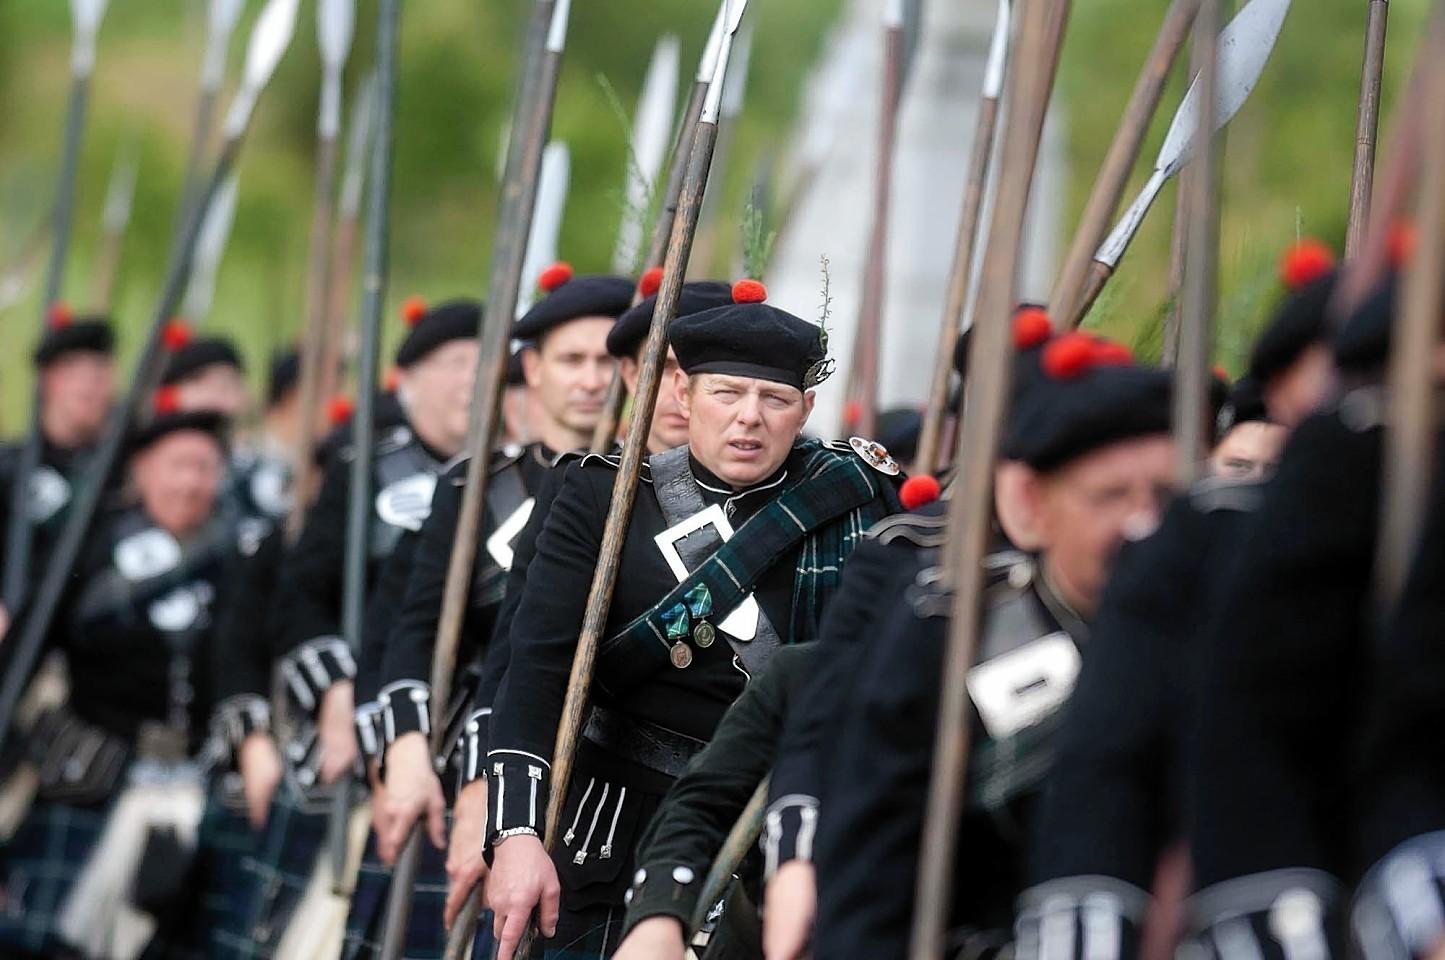 The Lonach Highlanders